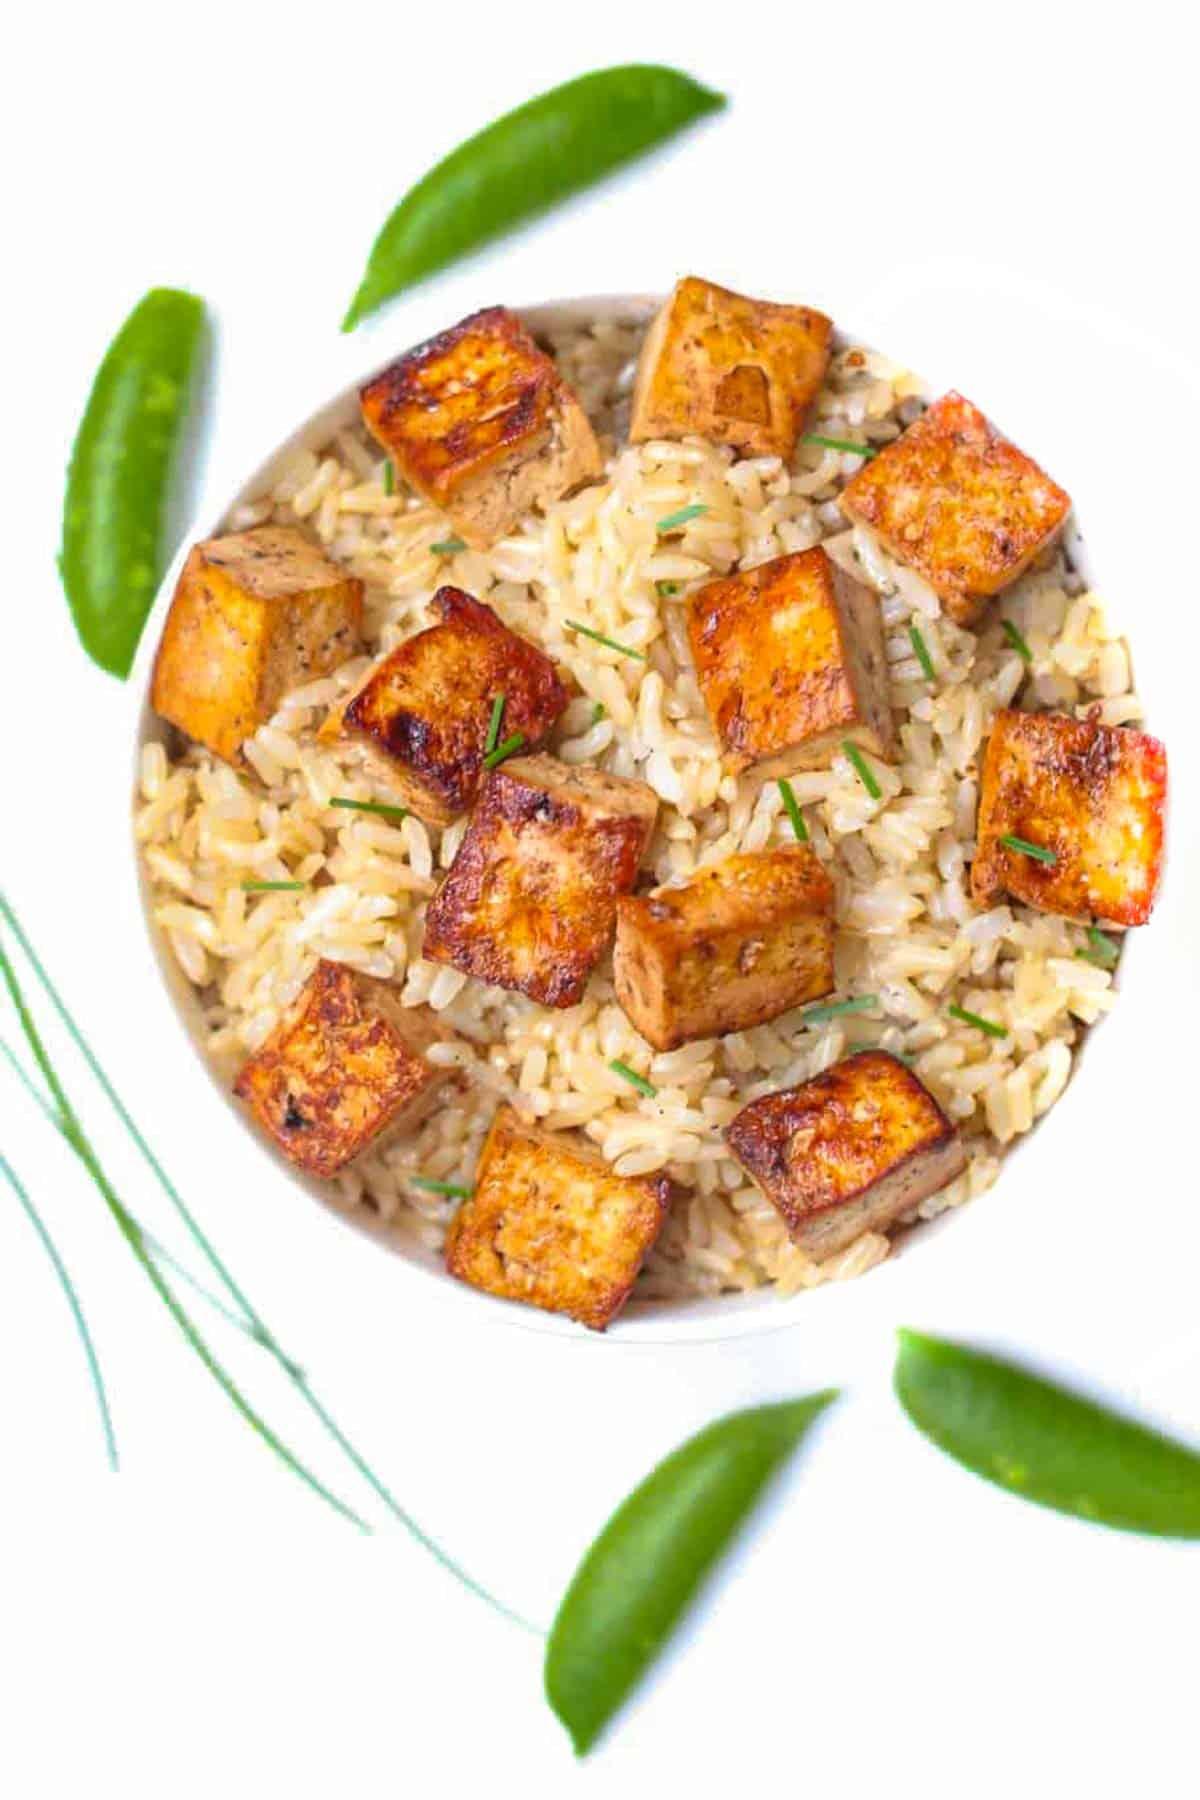 tofu in a bowl of brown rice